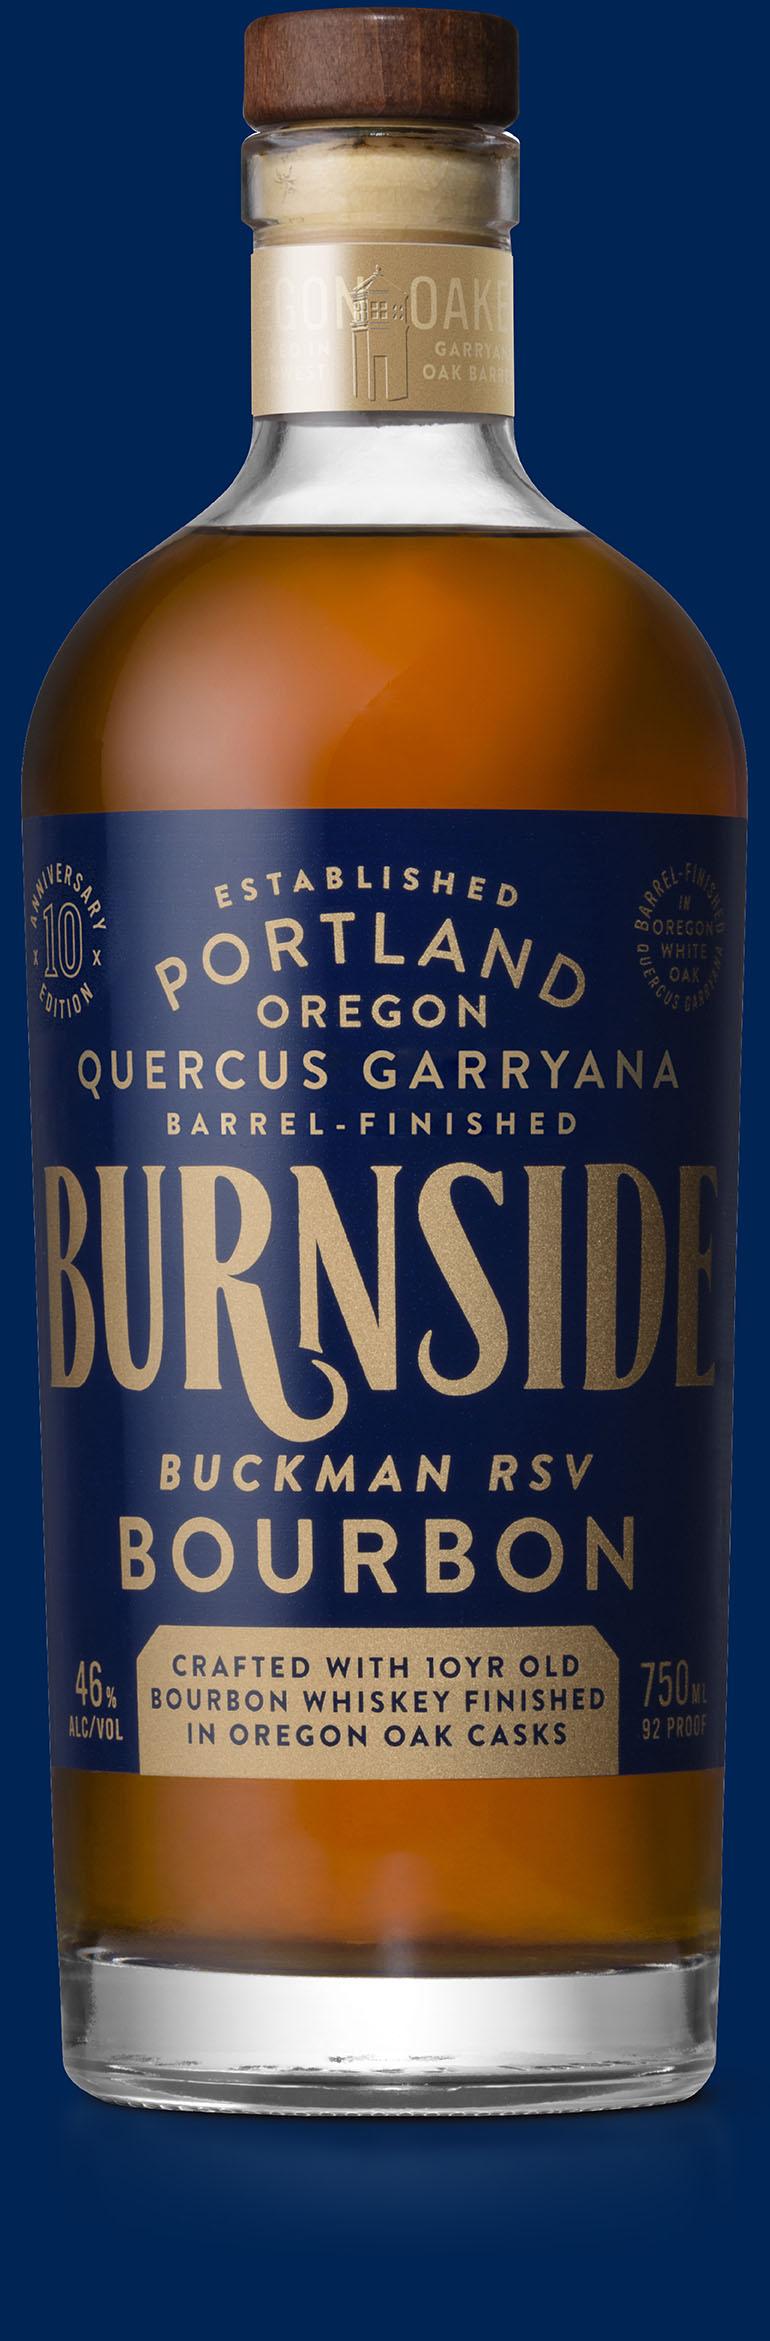 Buckman Reserve 10 Year Bourbon